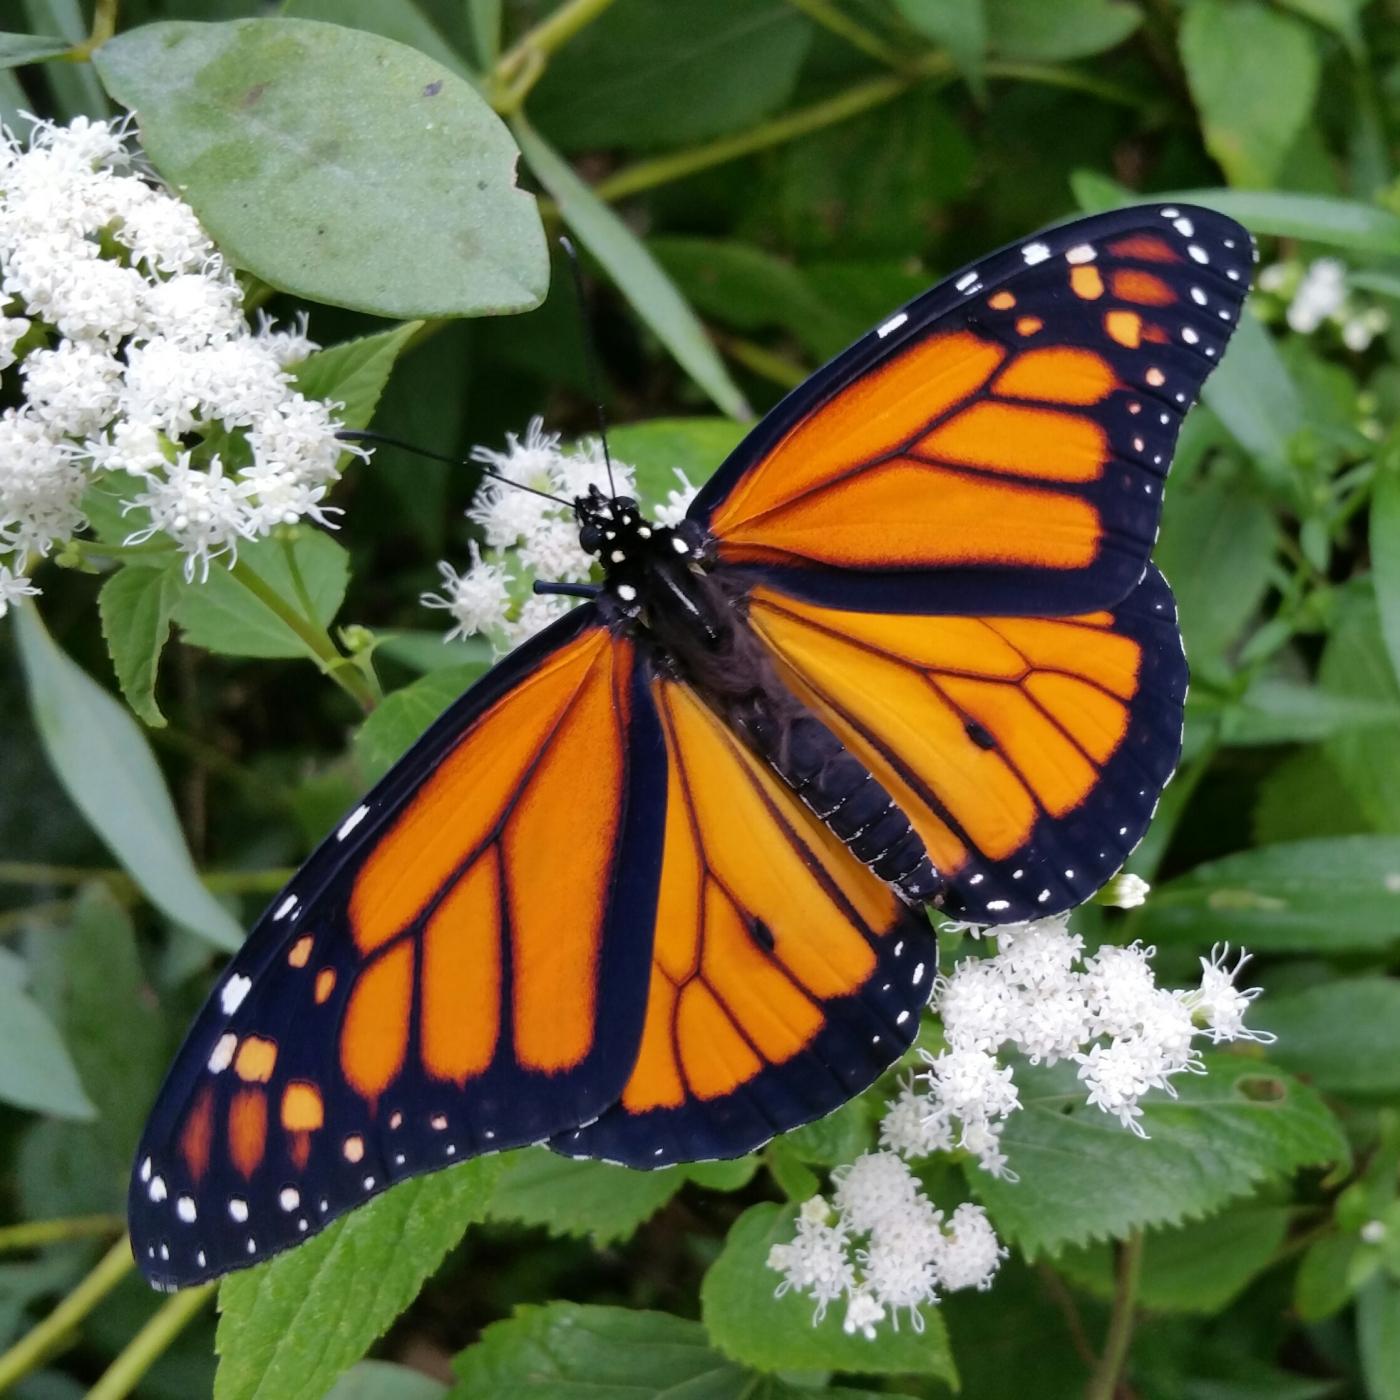 A freshly emerged male Monarch butterfly.